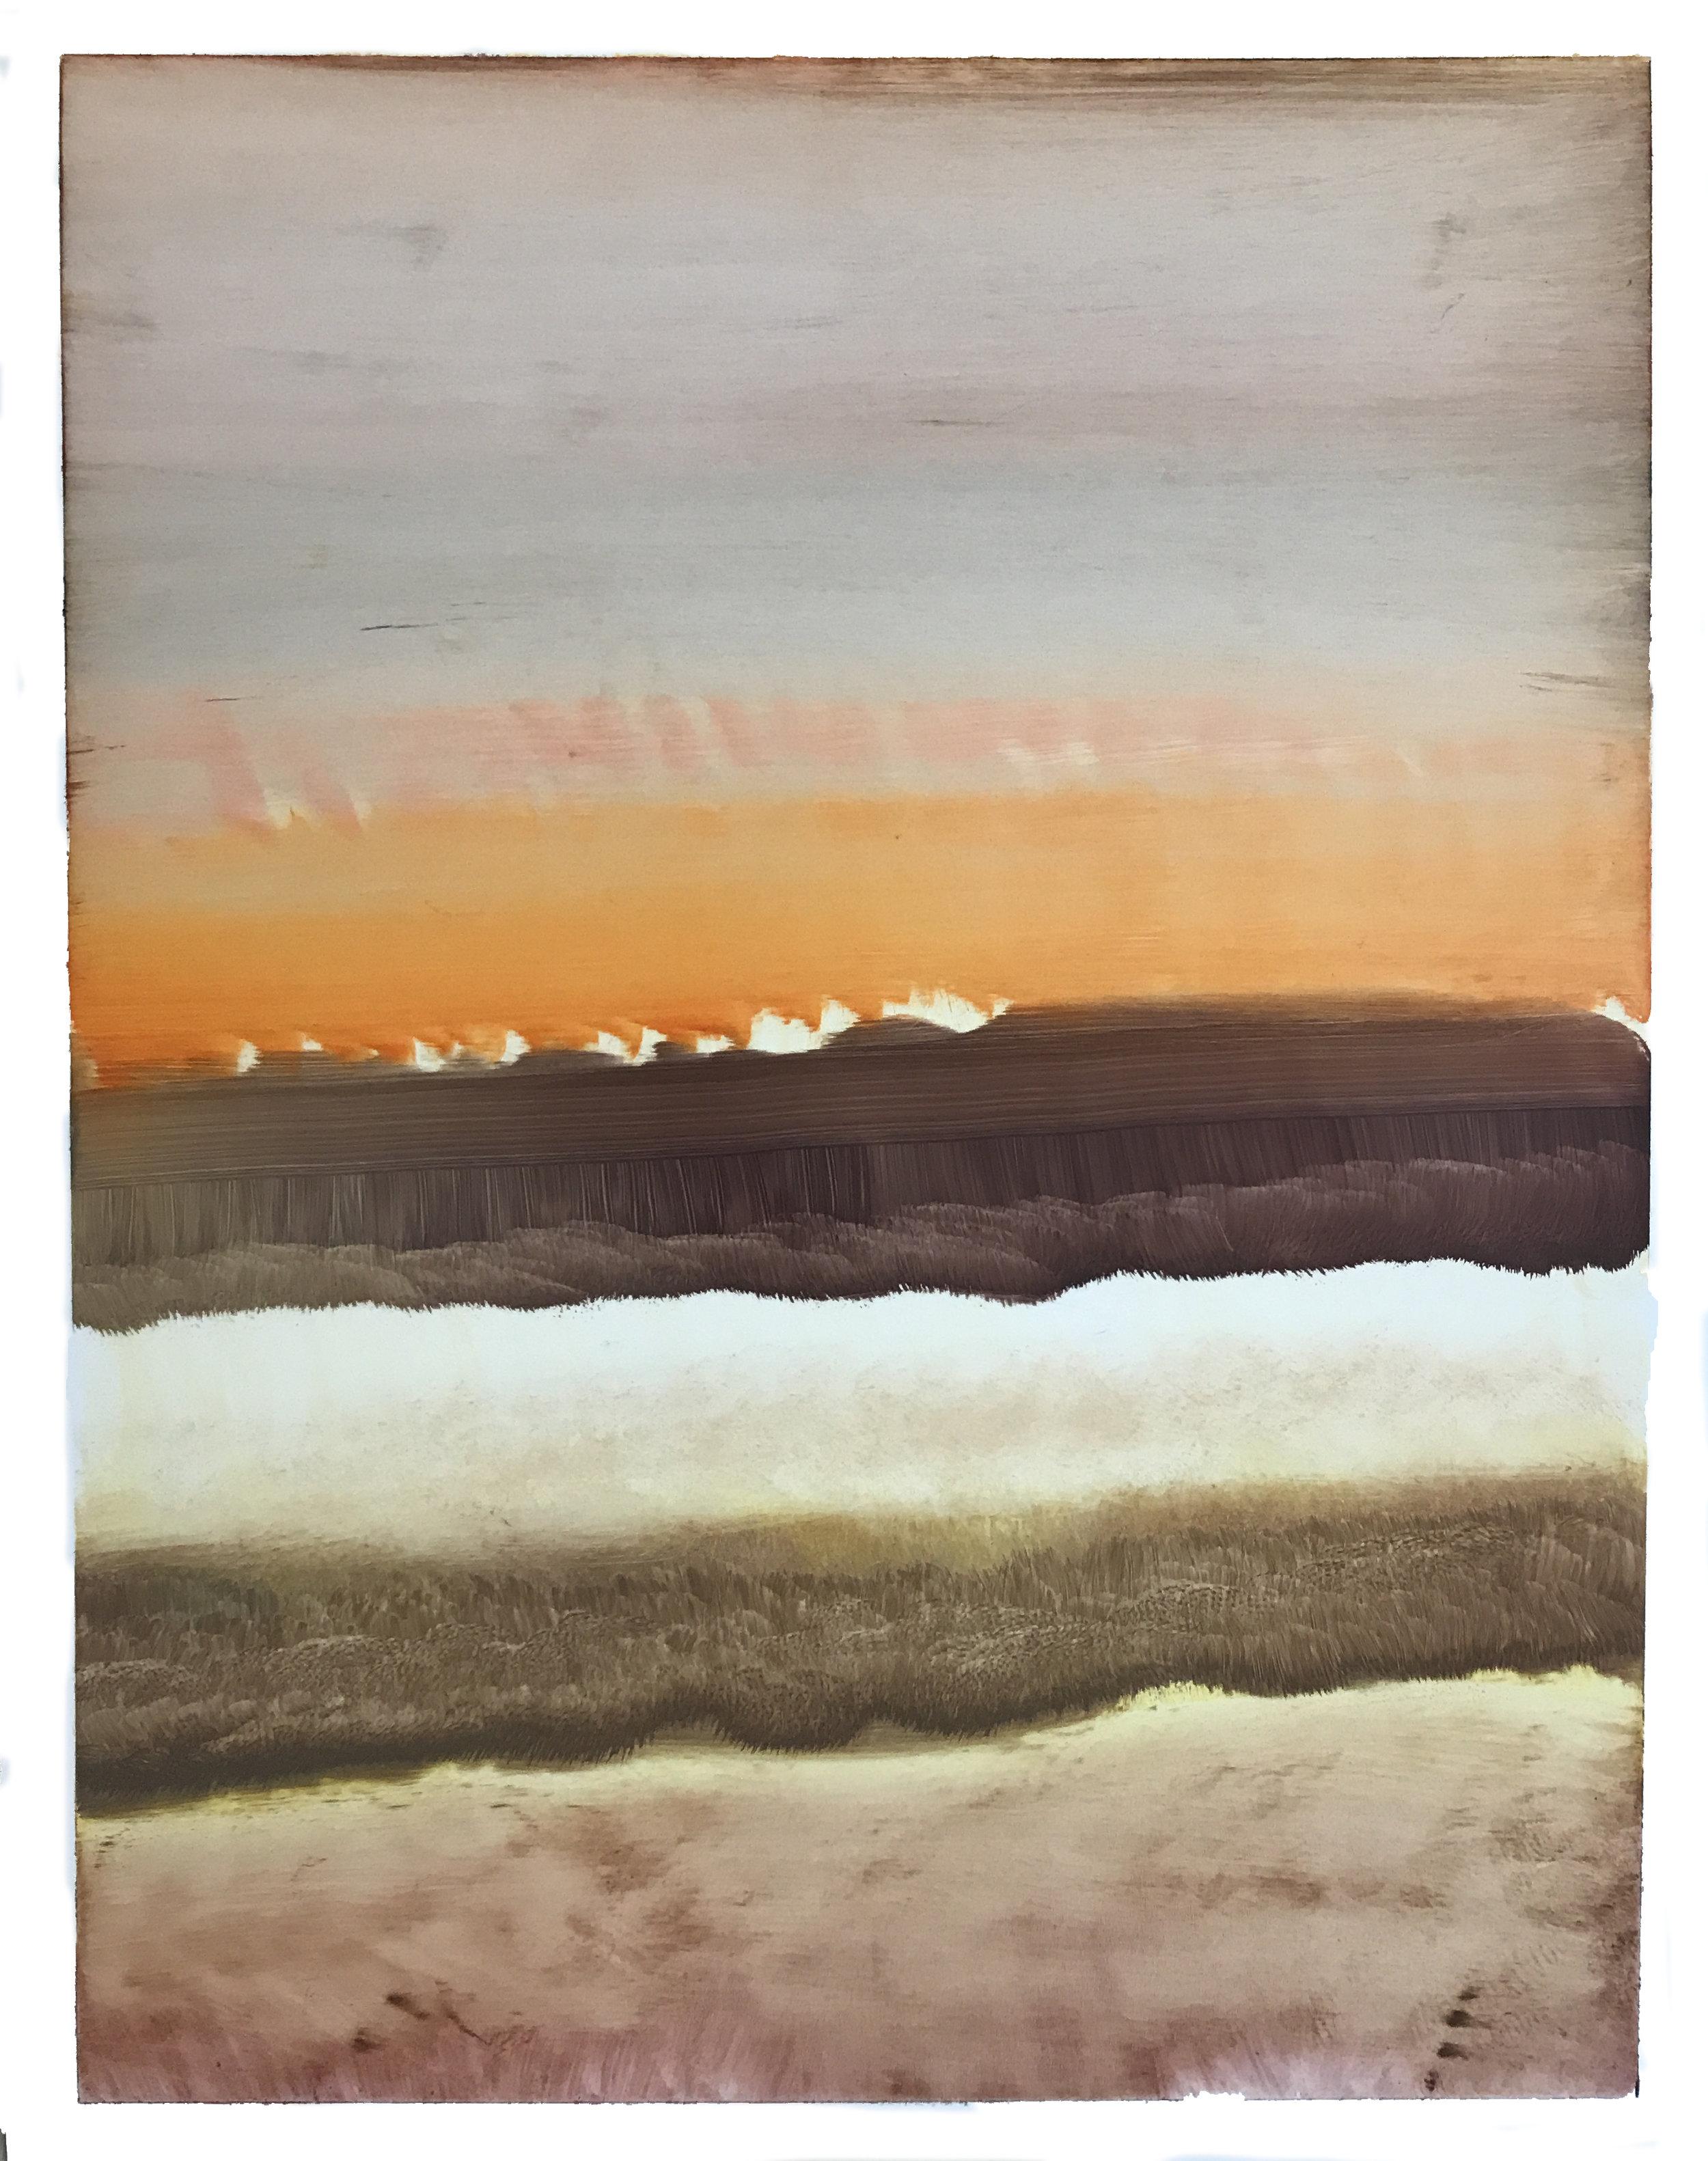 "O.T. (no.119), 11"" x 14"", oil on paper, 2018"